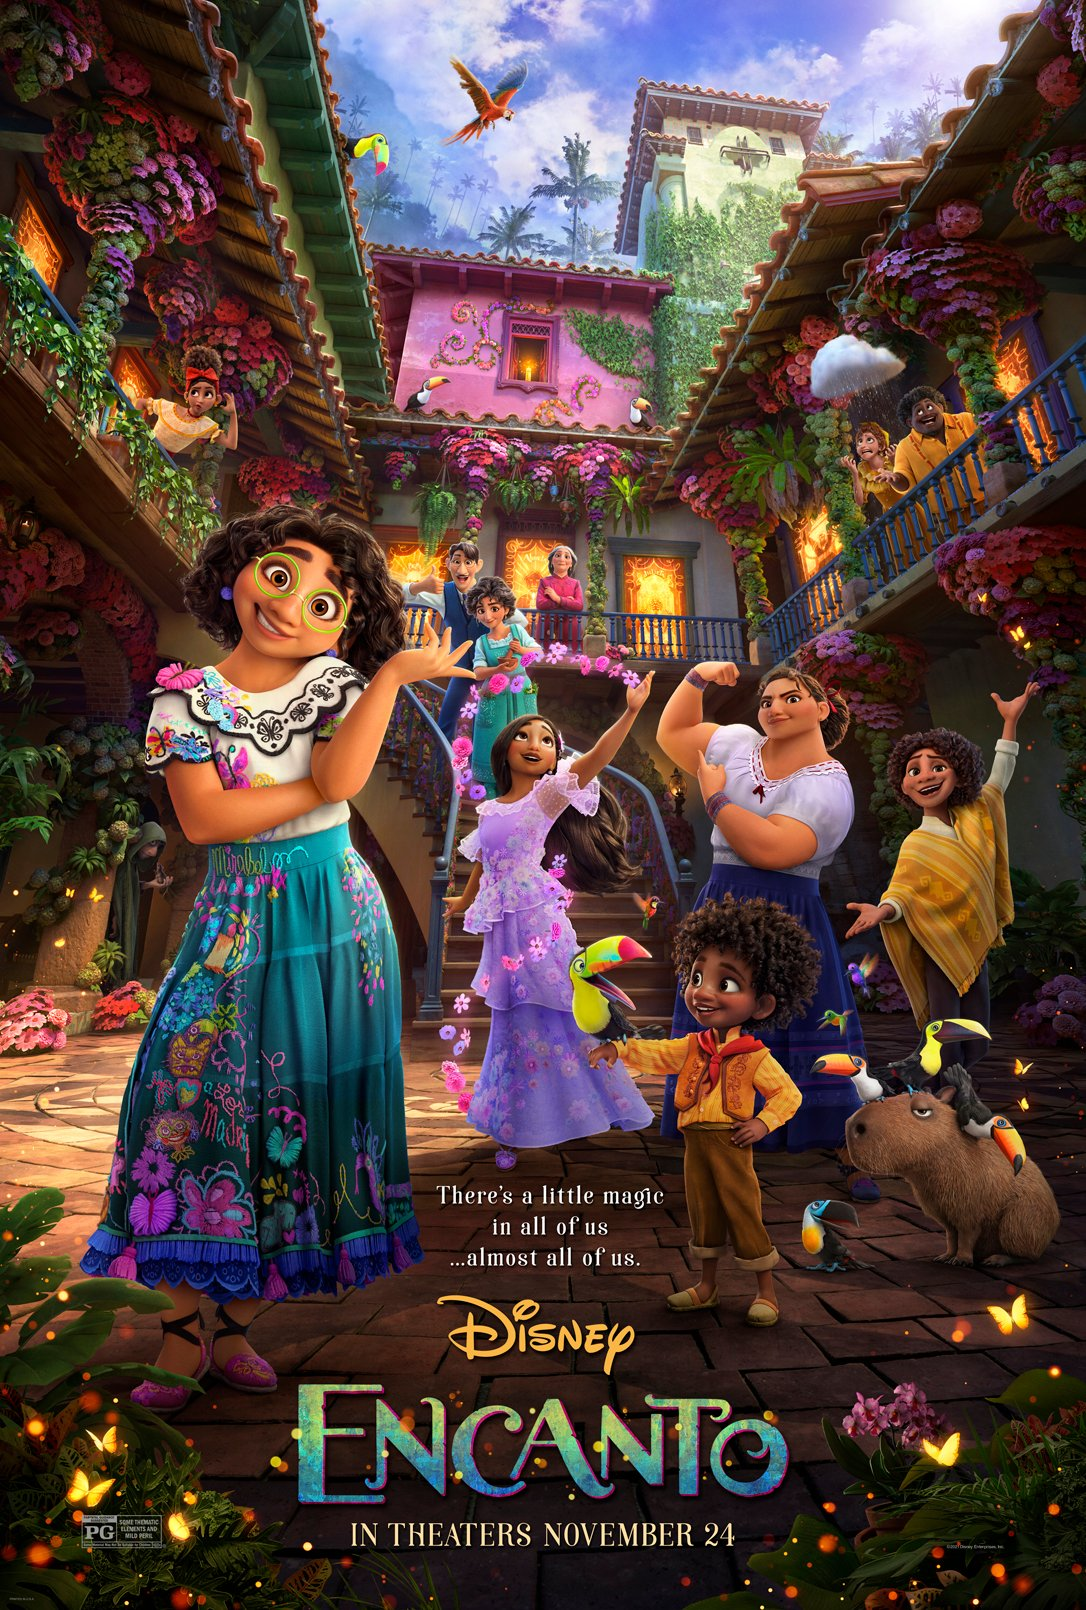 Encanto movie poster